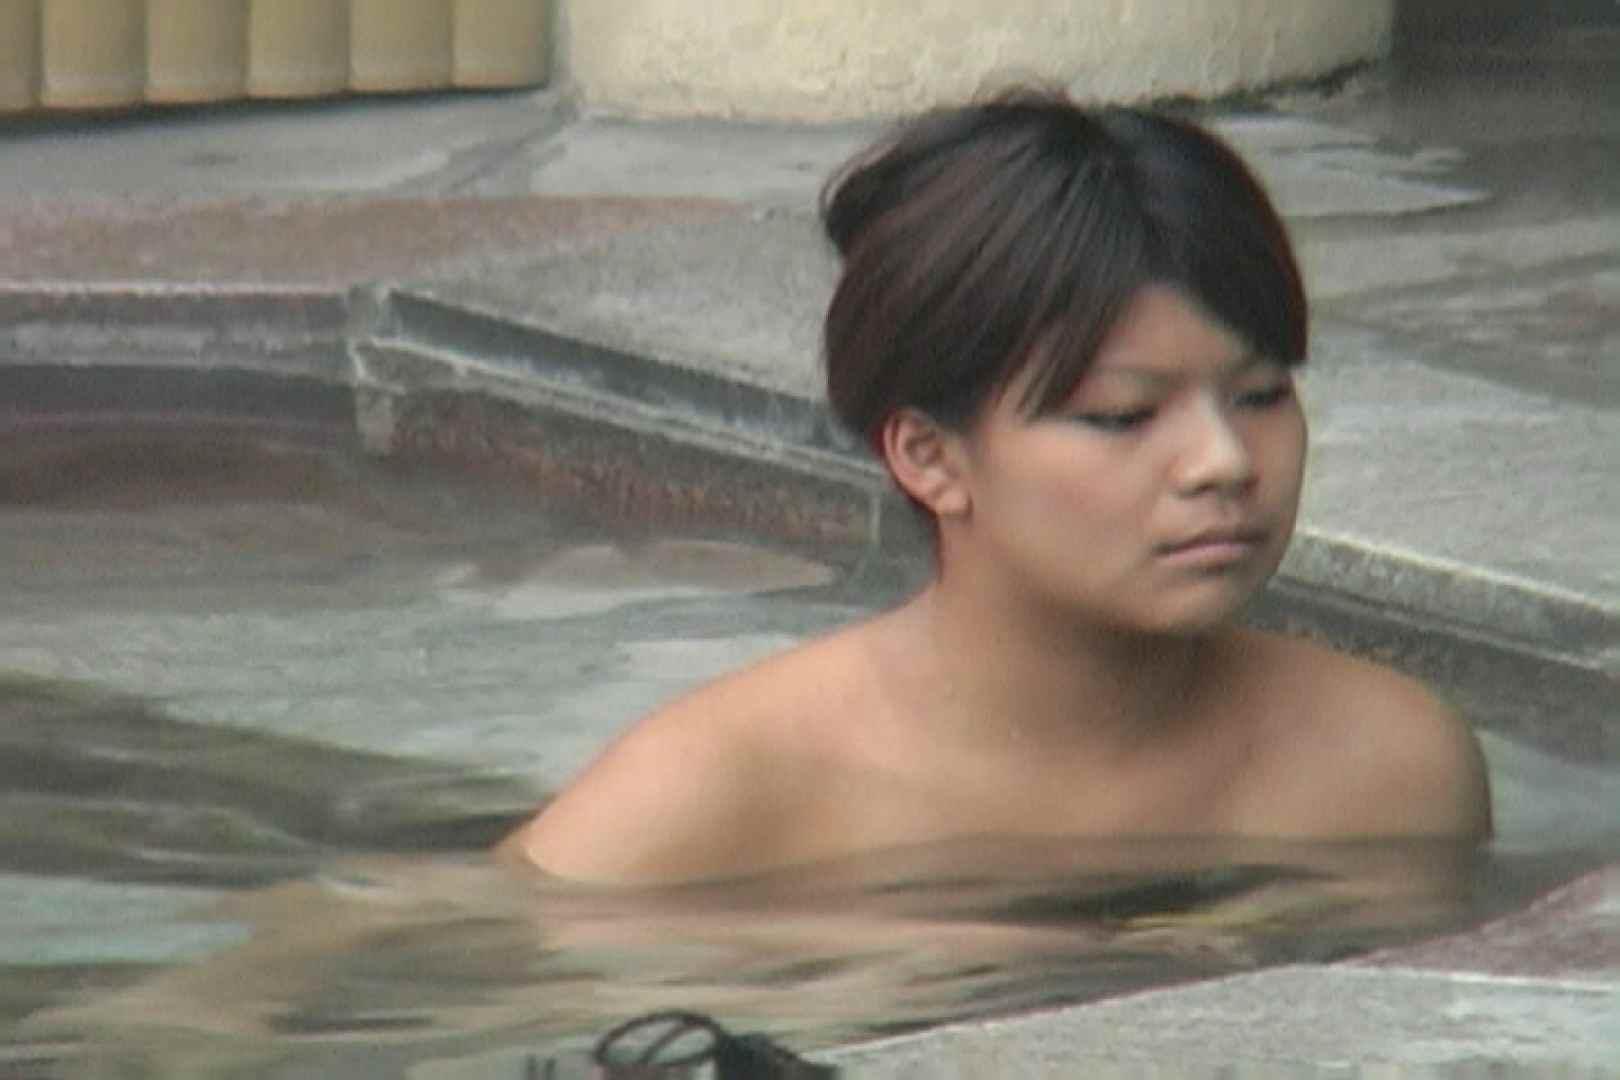 Aquaな露天風呂Vol.544 盗撮シリーズ   露天風呂編  80PIX 31